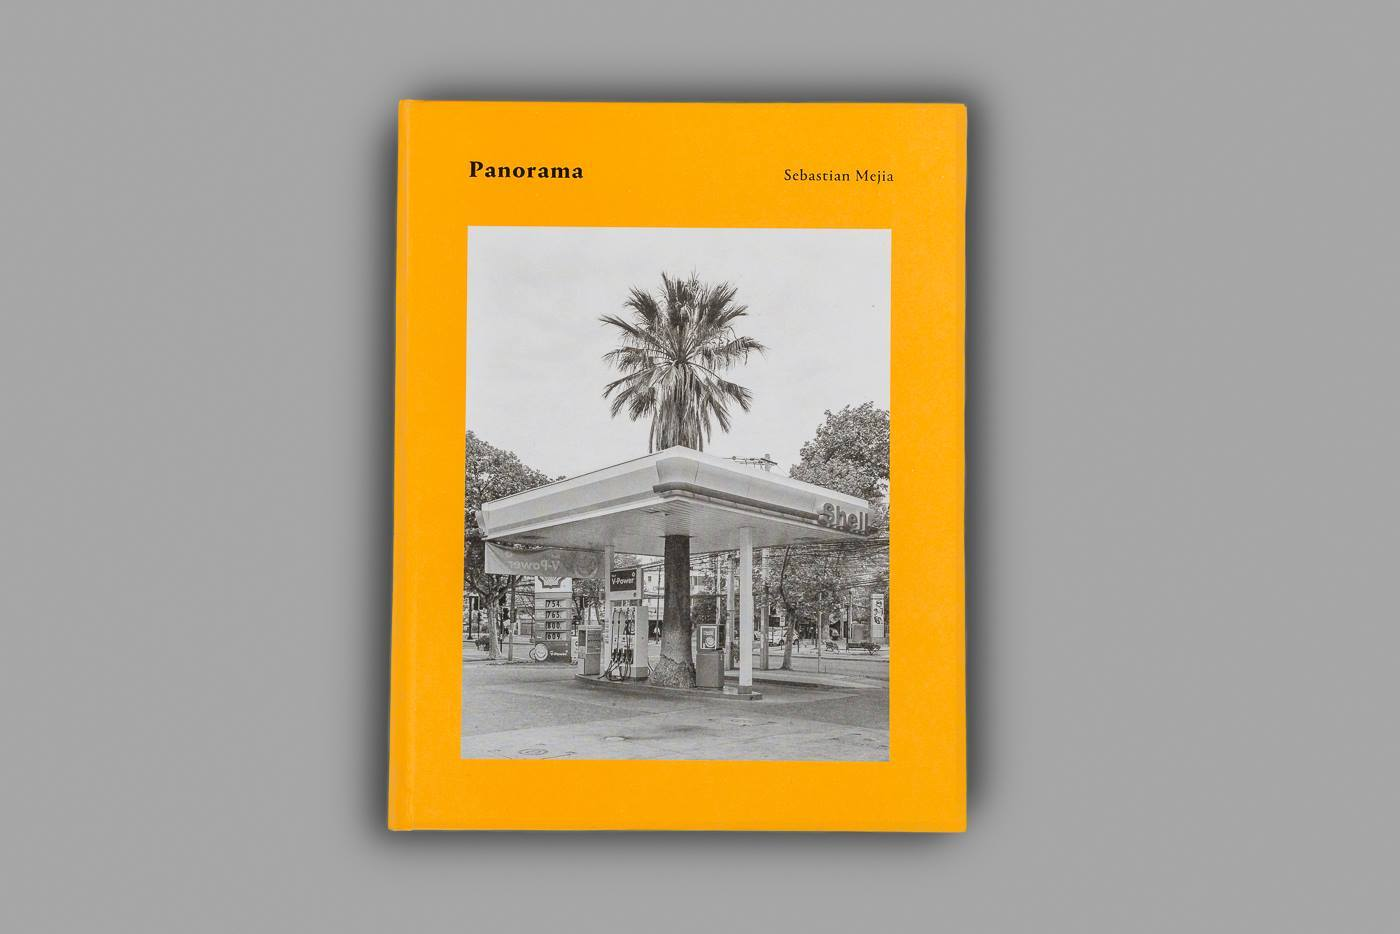 Panorama | Sebastián Rodriguez Besa